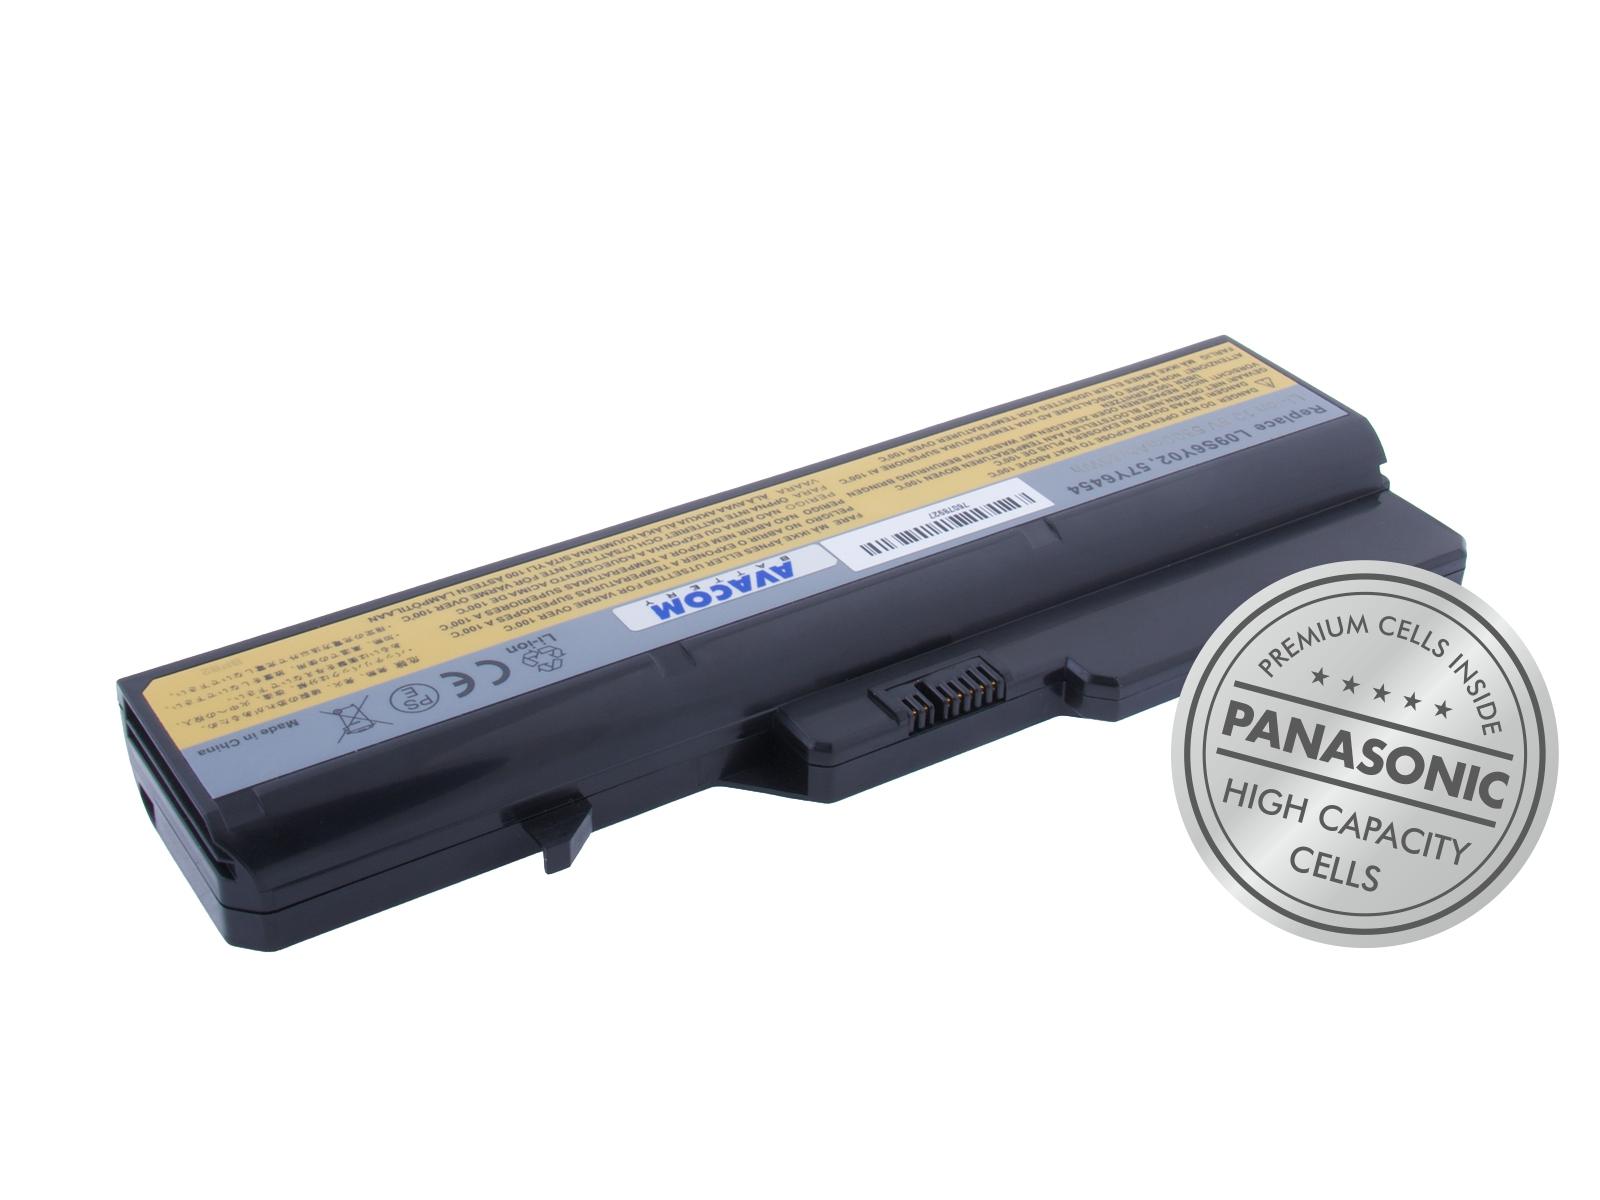 Baterie AVACOM NOLE-G560-P29 pro Lenovo G560, IdeaPad V470 series Li-Ion 10,8V 5800mAh 63Wh, NOLE-G5